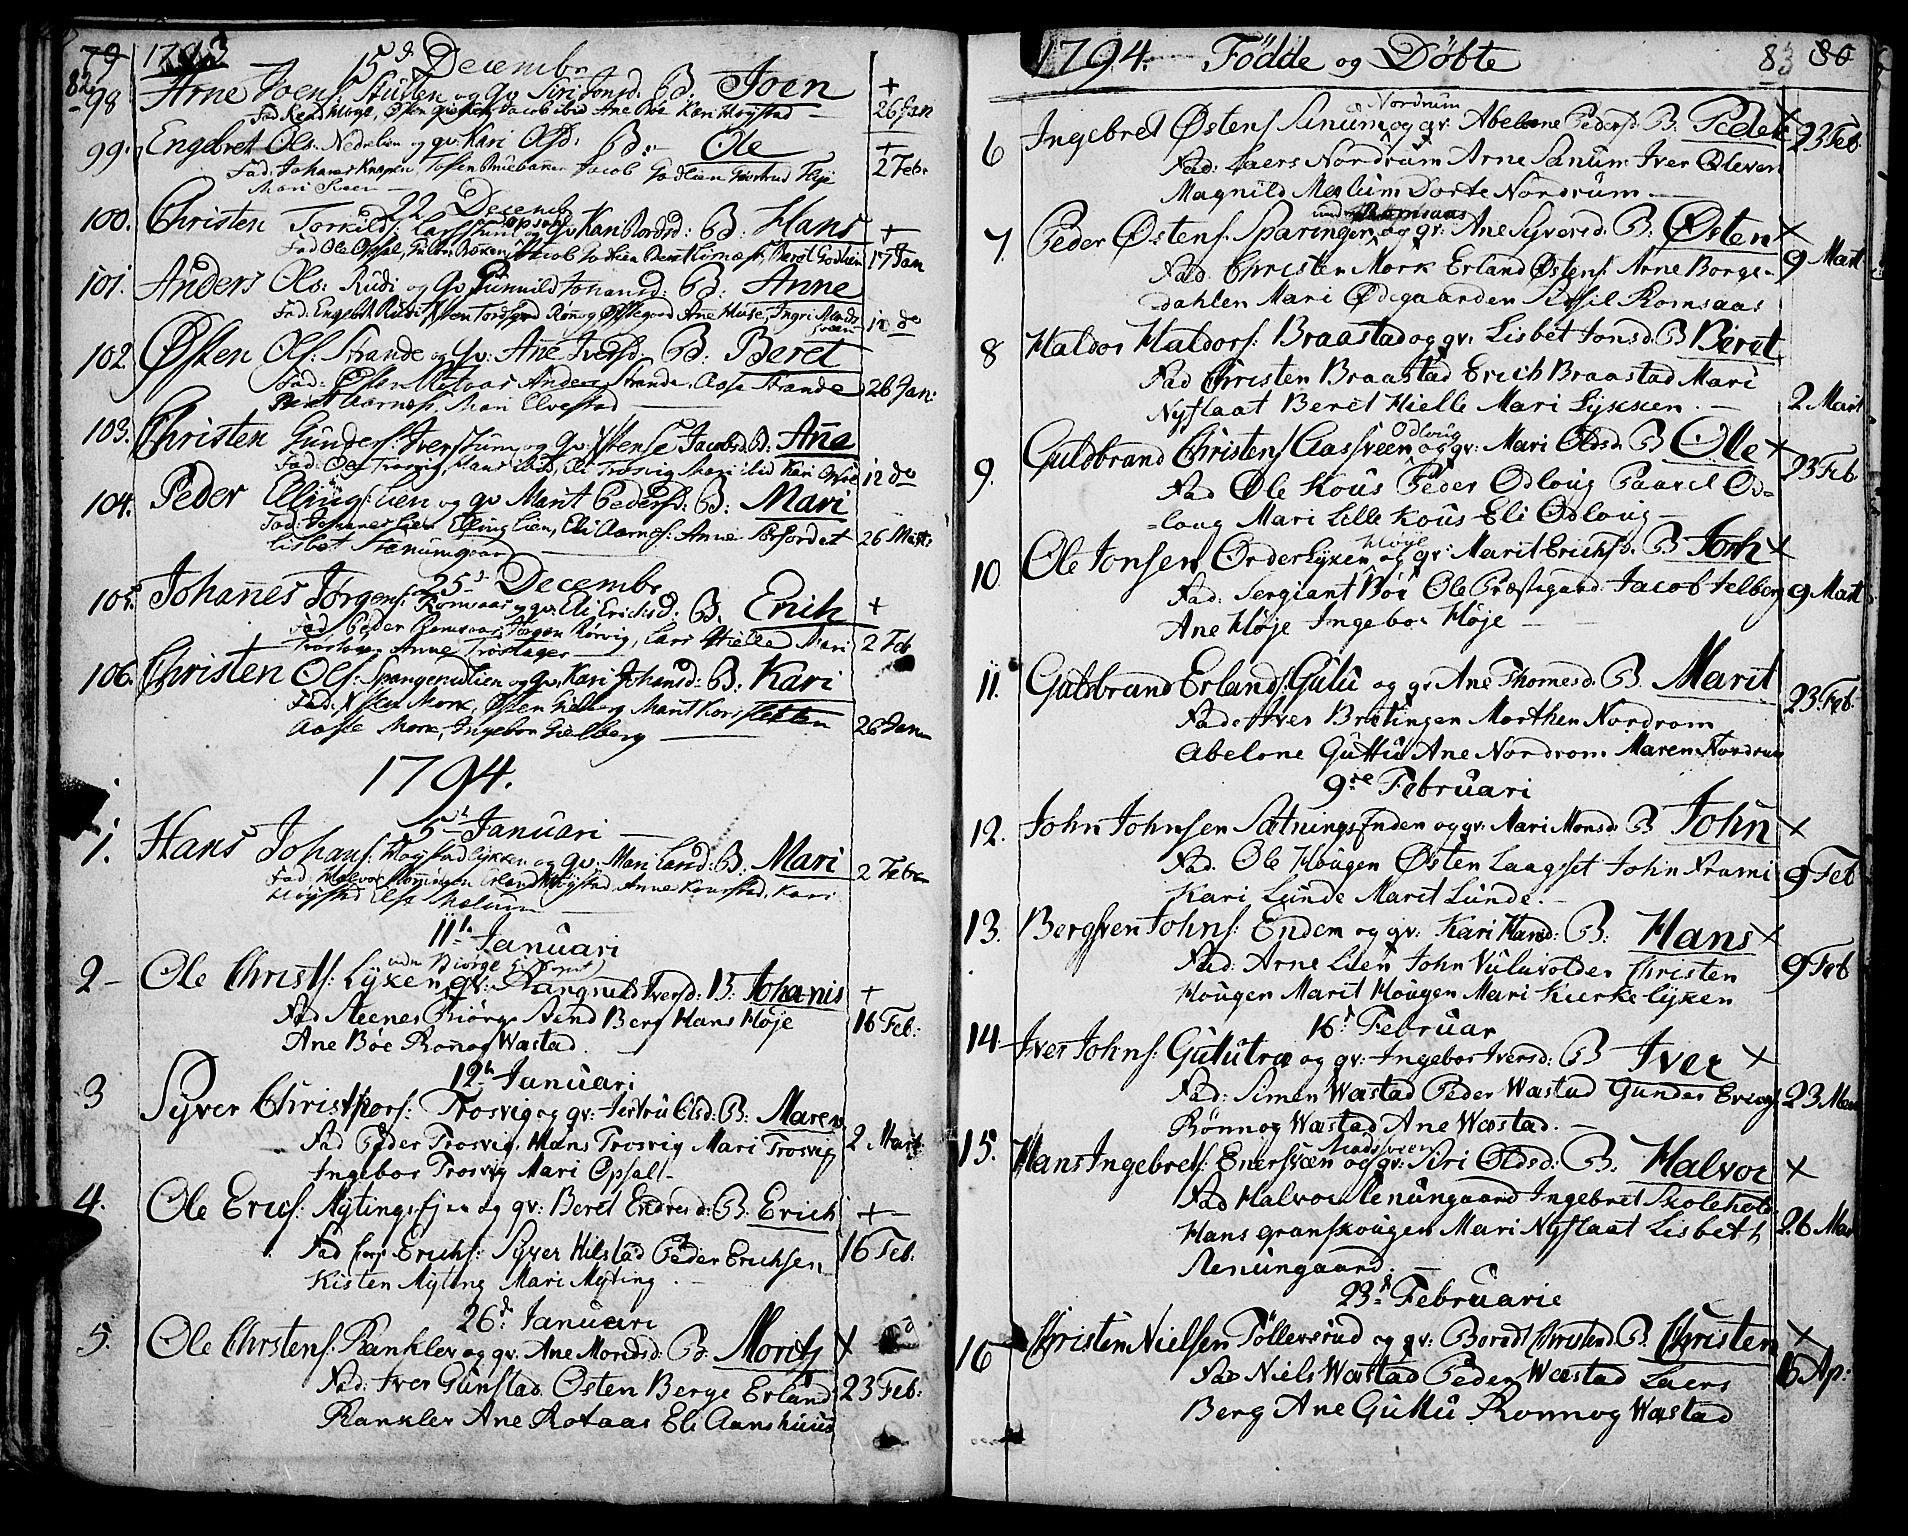 SAH, Ringebu prestekontor, Ministerialbok nr. 3, 1781-1820, s. 82-83